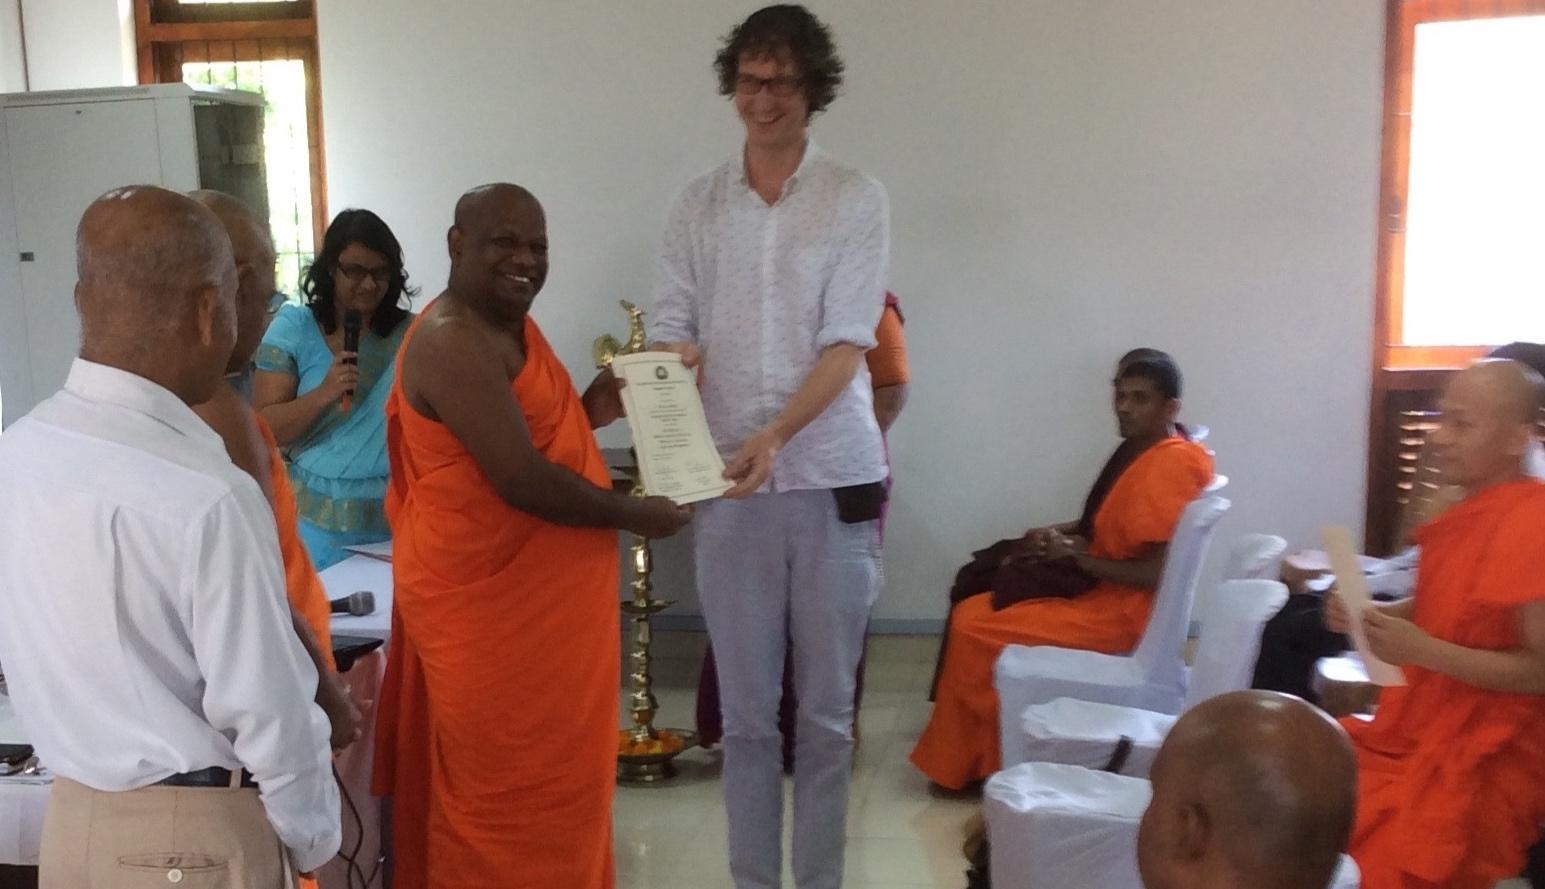 Buddhist Ayurvedic award ceremony in Sri Lanka at the  Nagananda International Institute for Buddhist Studies (NIIBS)